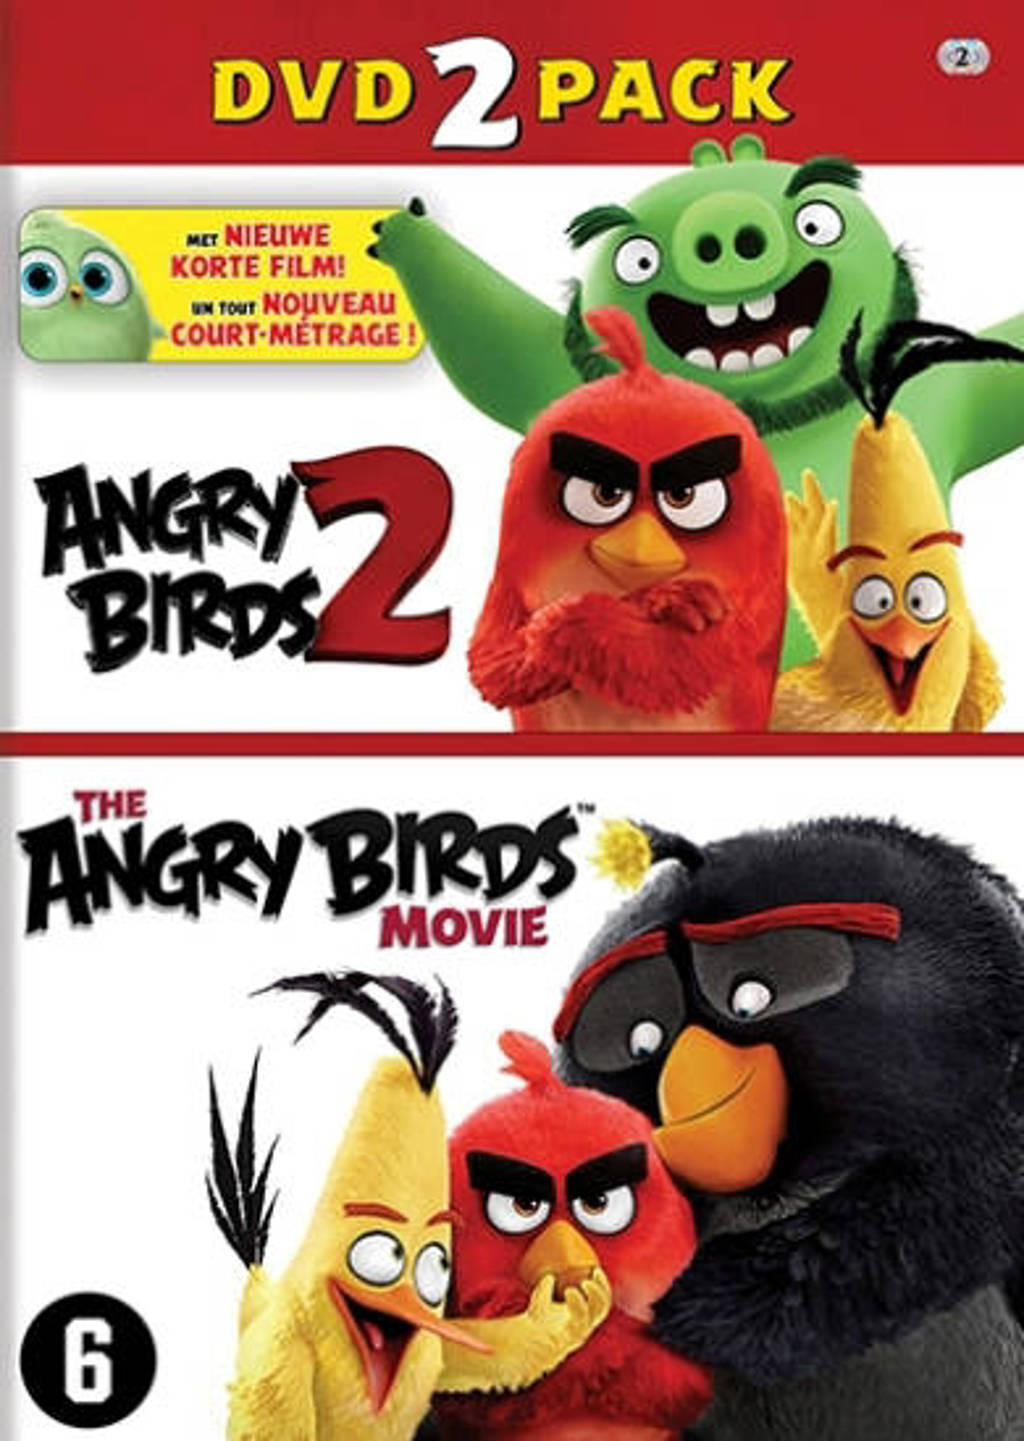 Angry birds movie 1+2 (BE) (DVD)